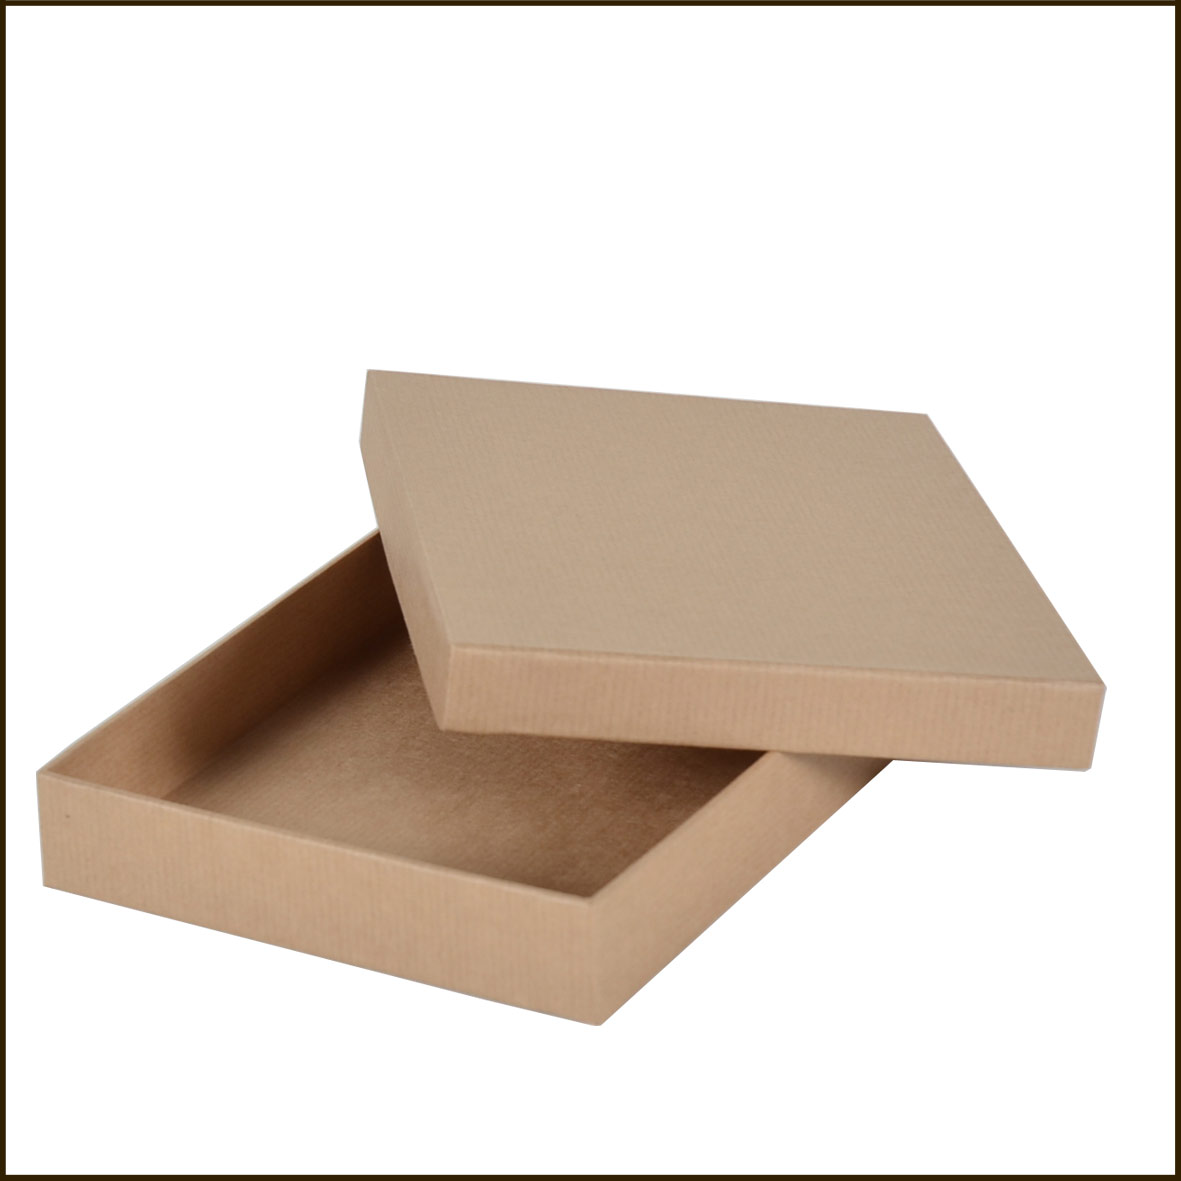 Cherche boites standard en papier / carton -250*250*50 mm environ.